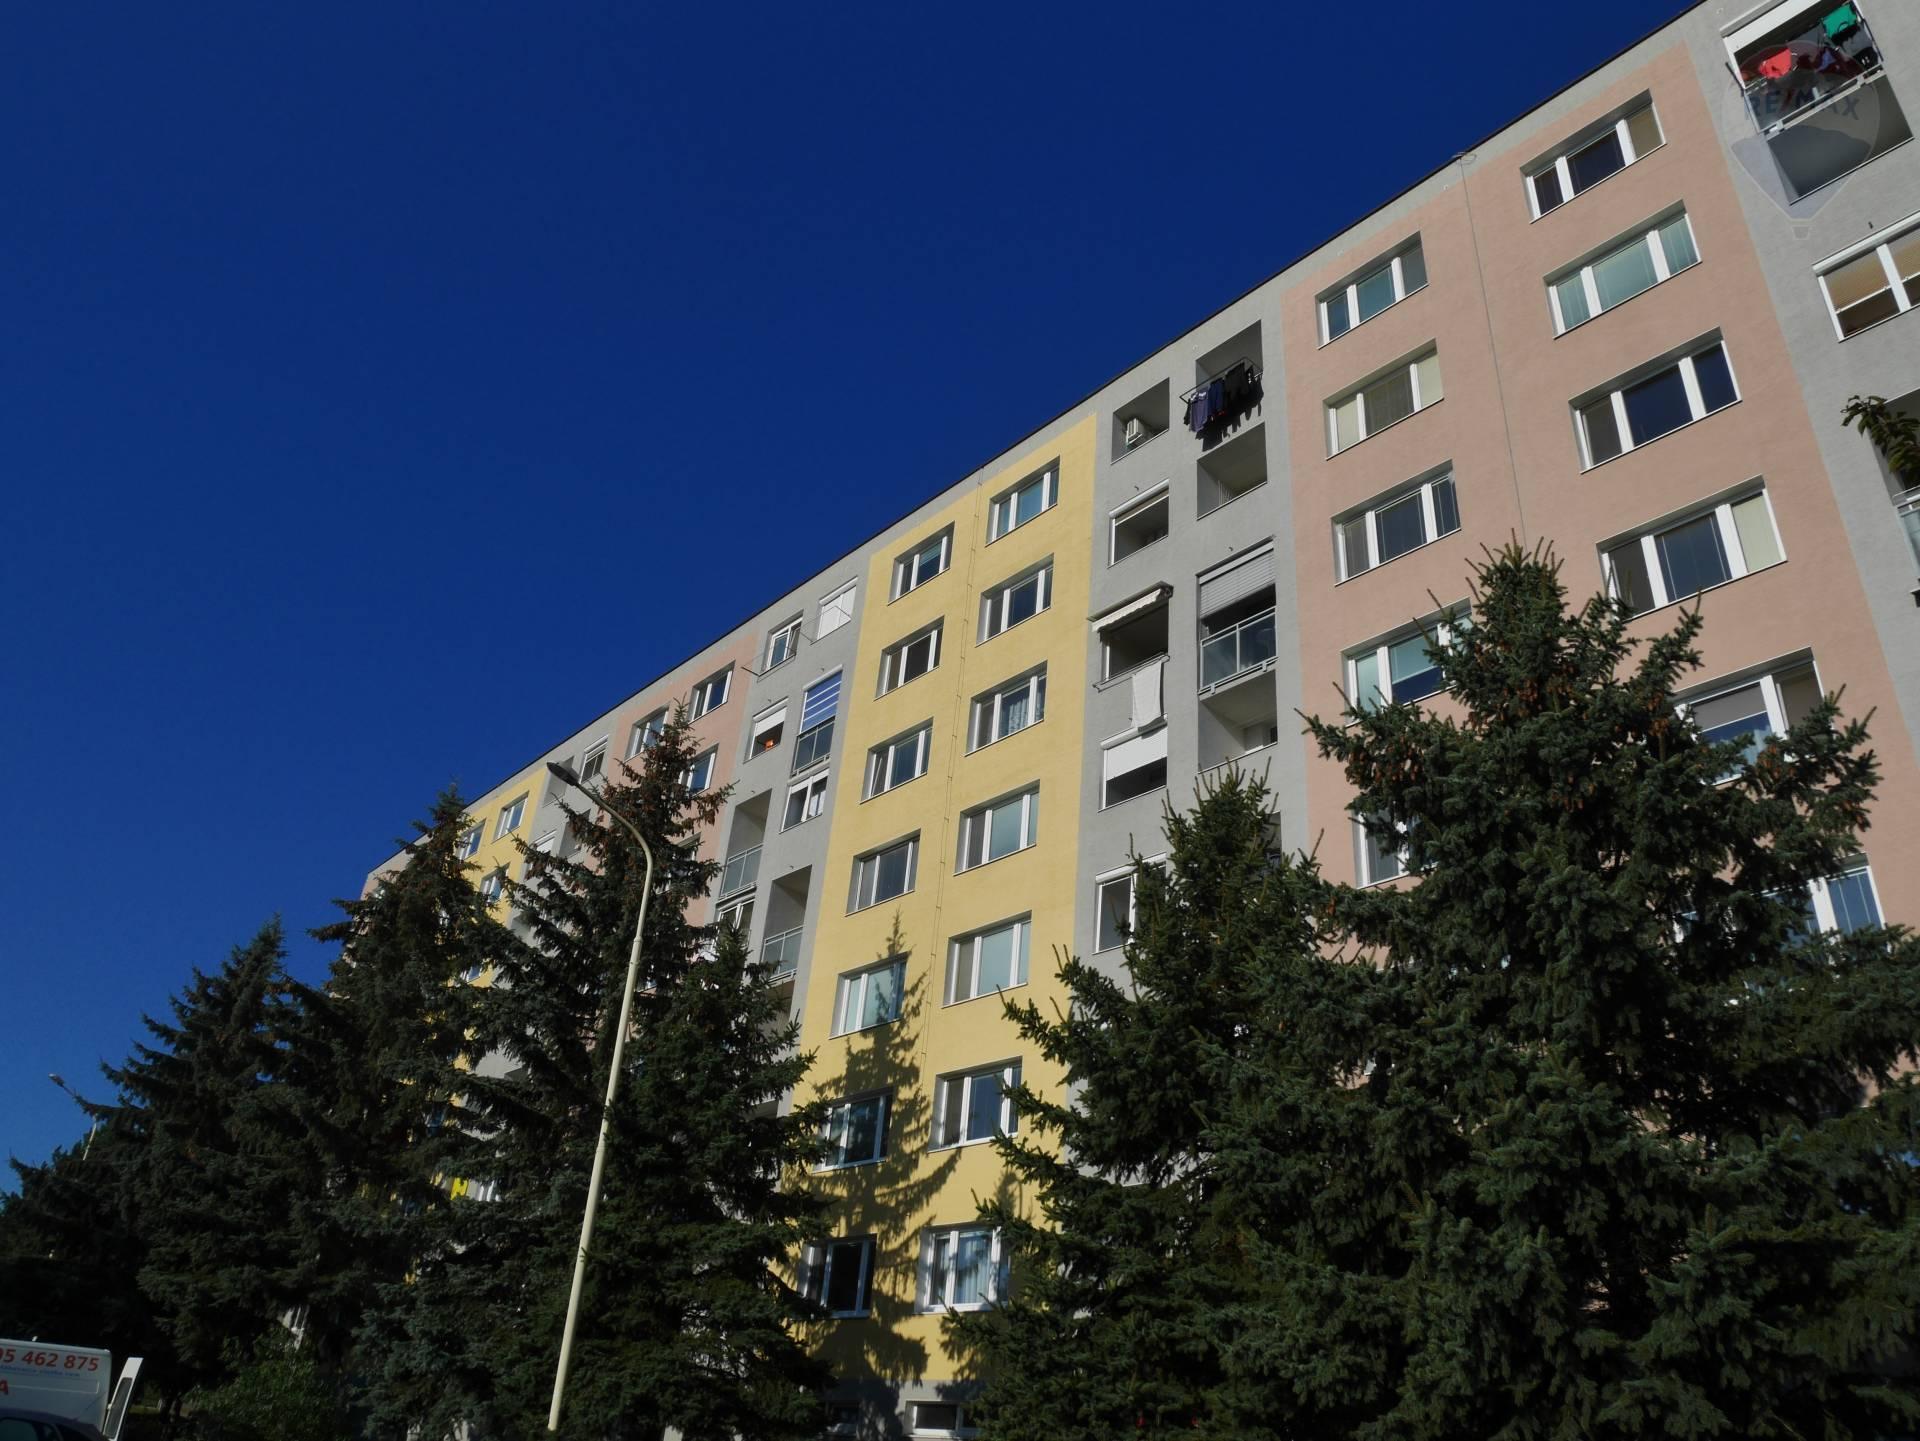 3 izbový byt, 64m2, ul. Nad Terasami v Prievidzi